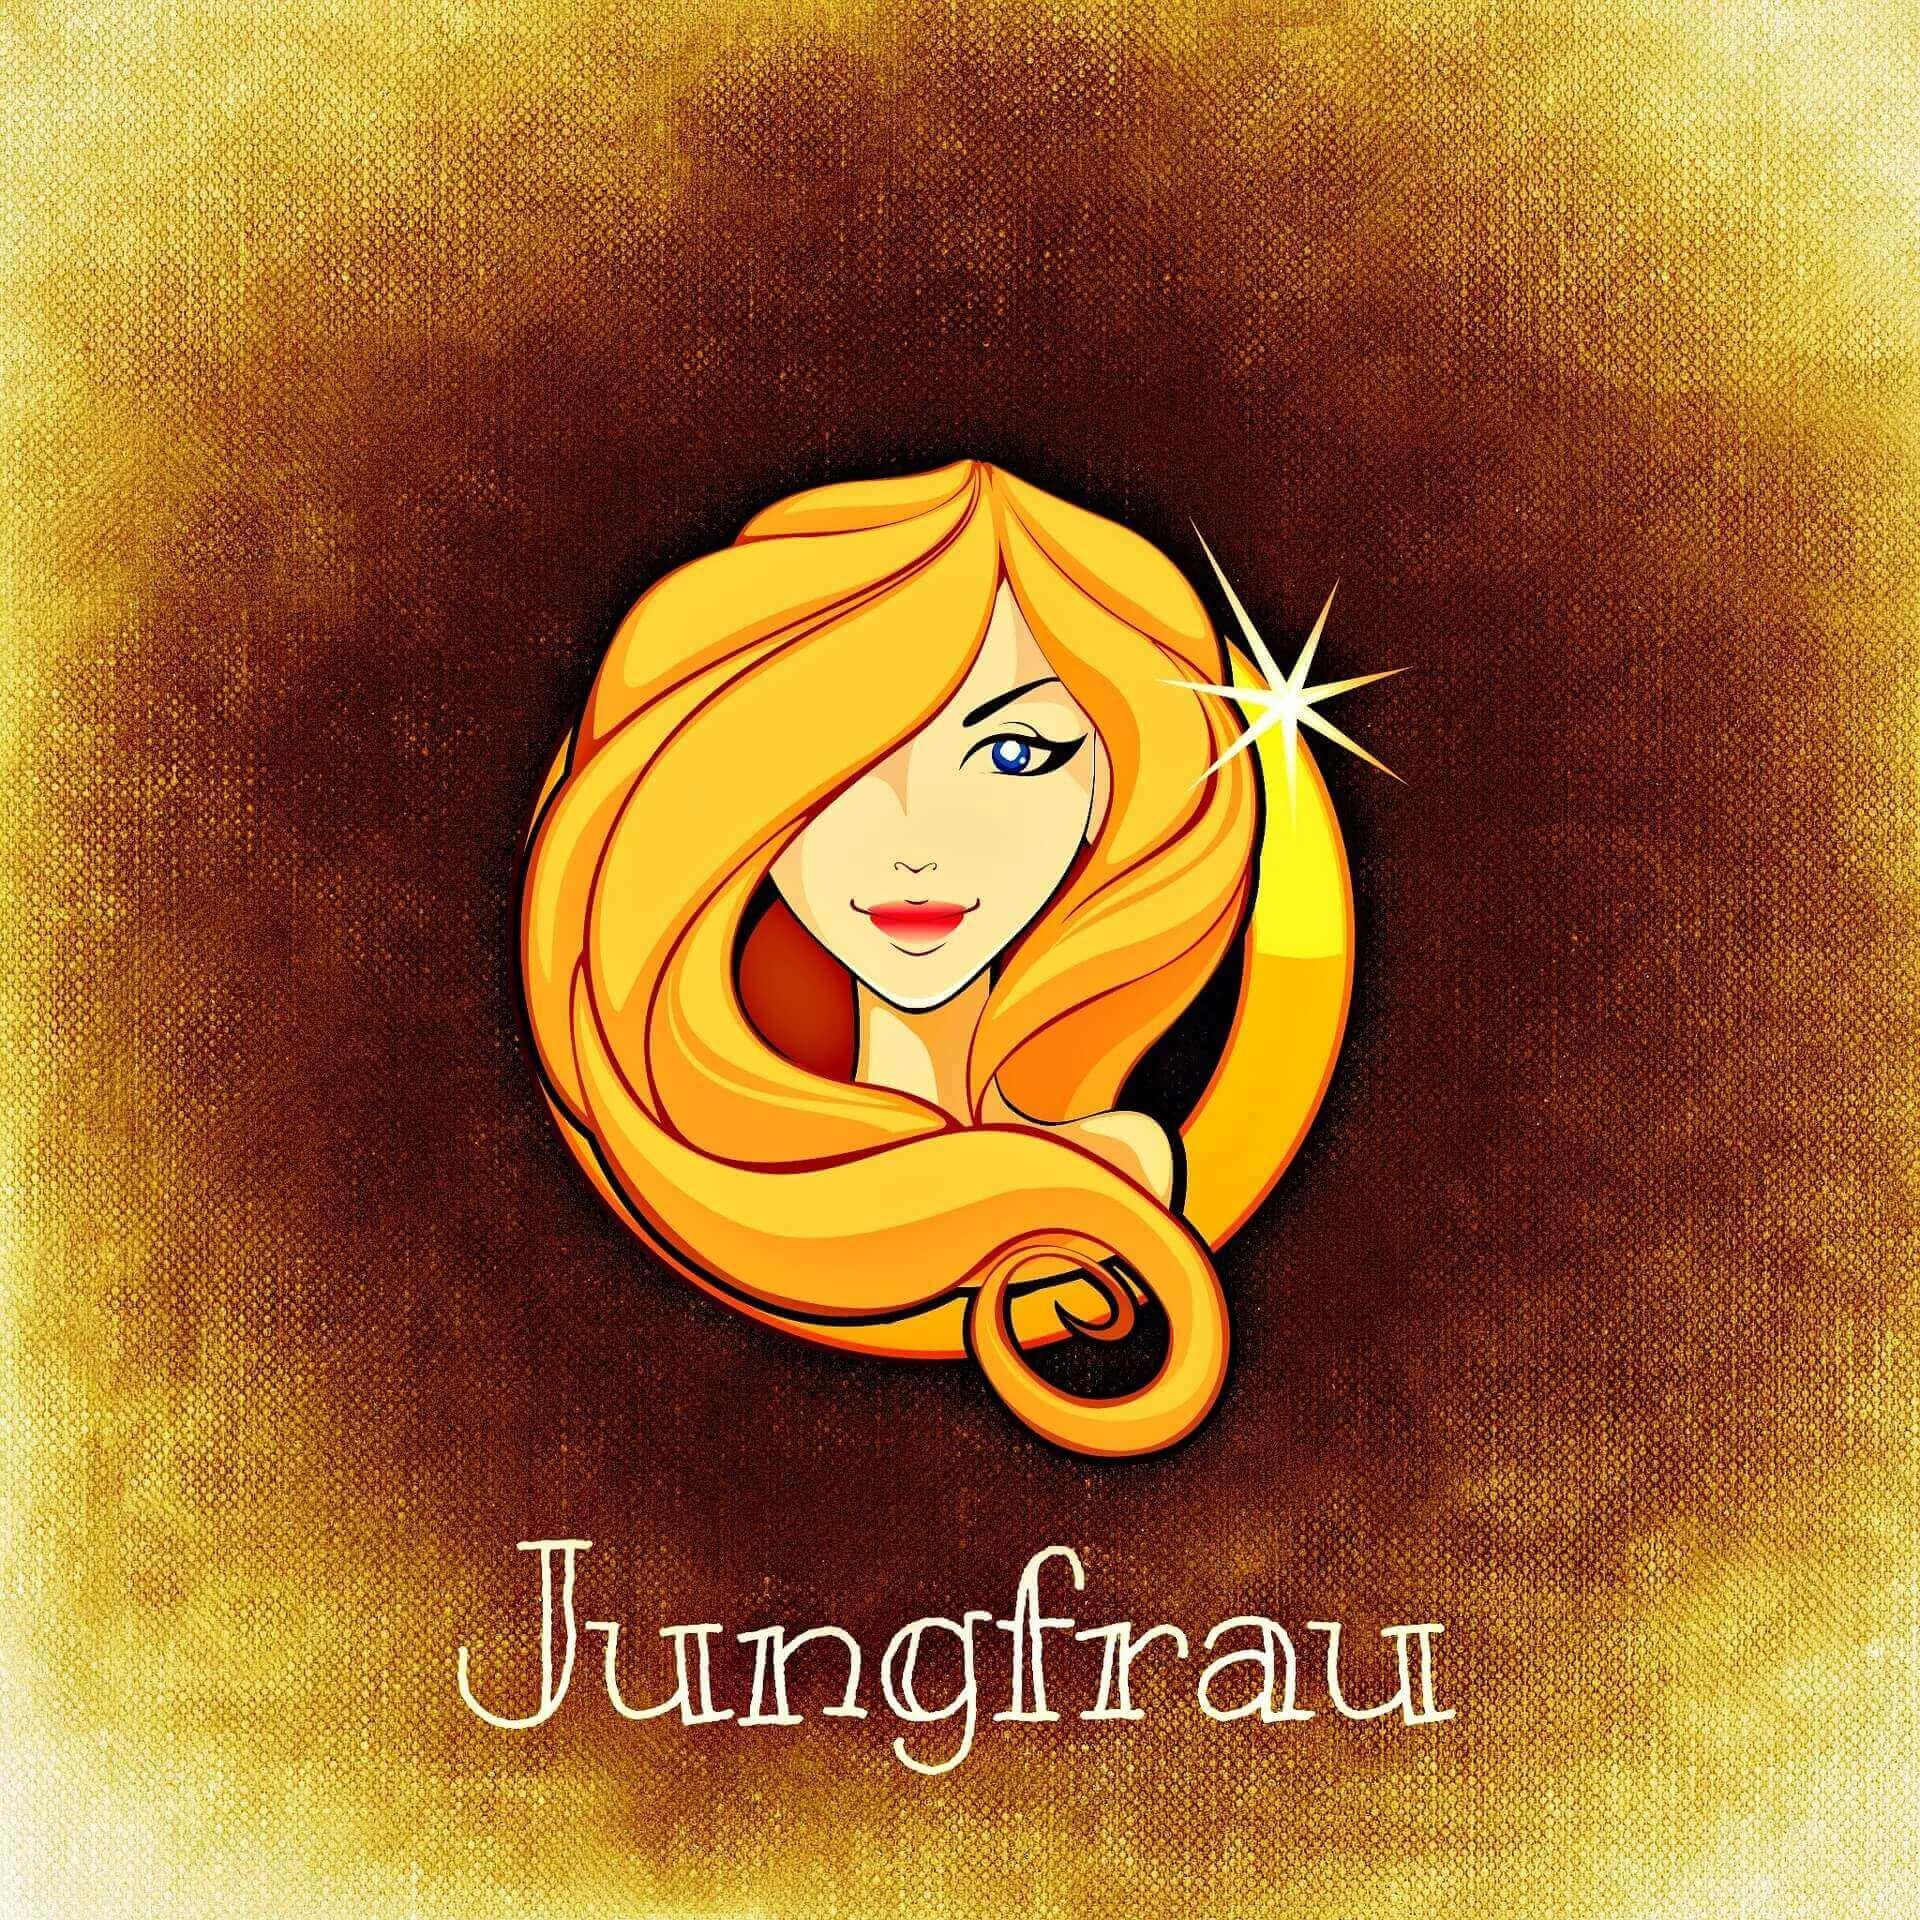 Horoskop Jungfrau Bild